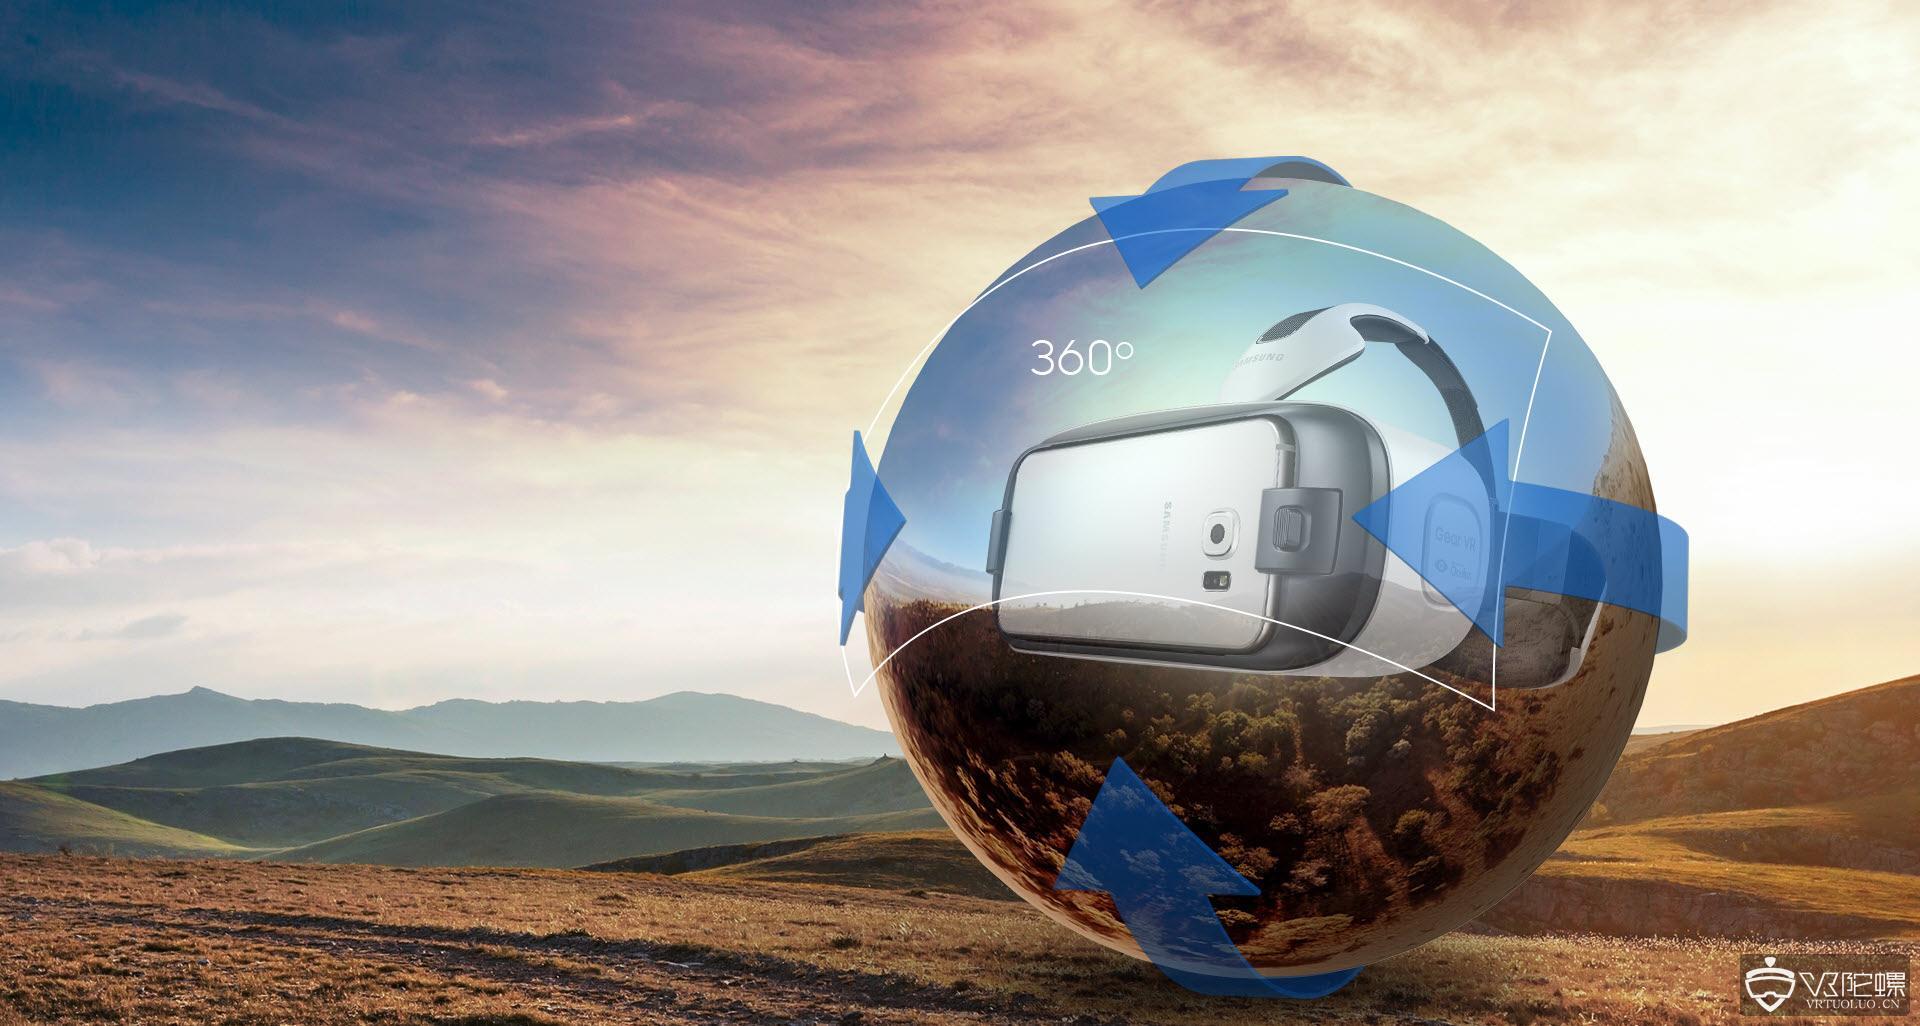 YouTube,Daydream和VRScout三家合作,VR创作者实验室计划即将开启